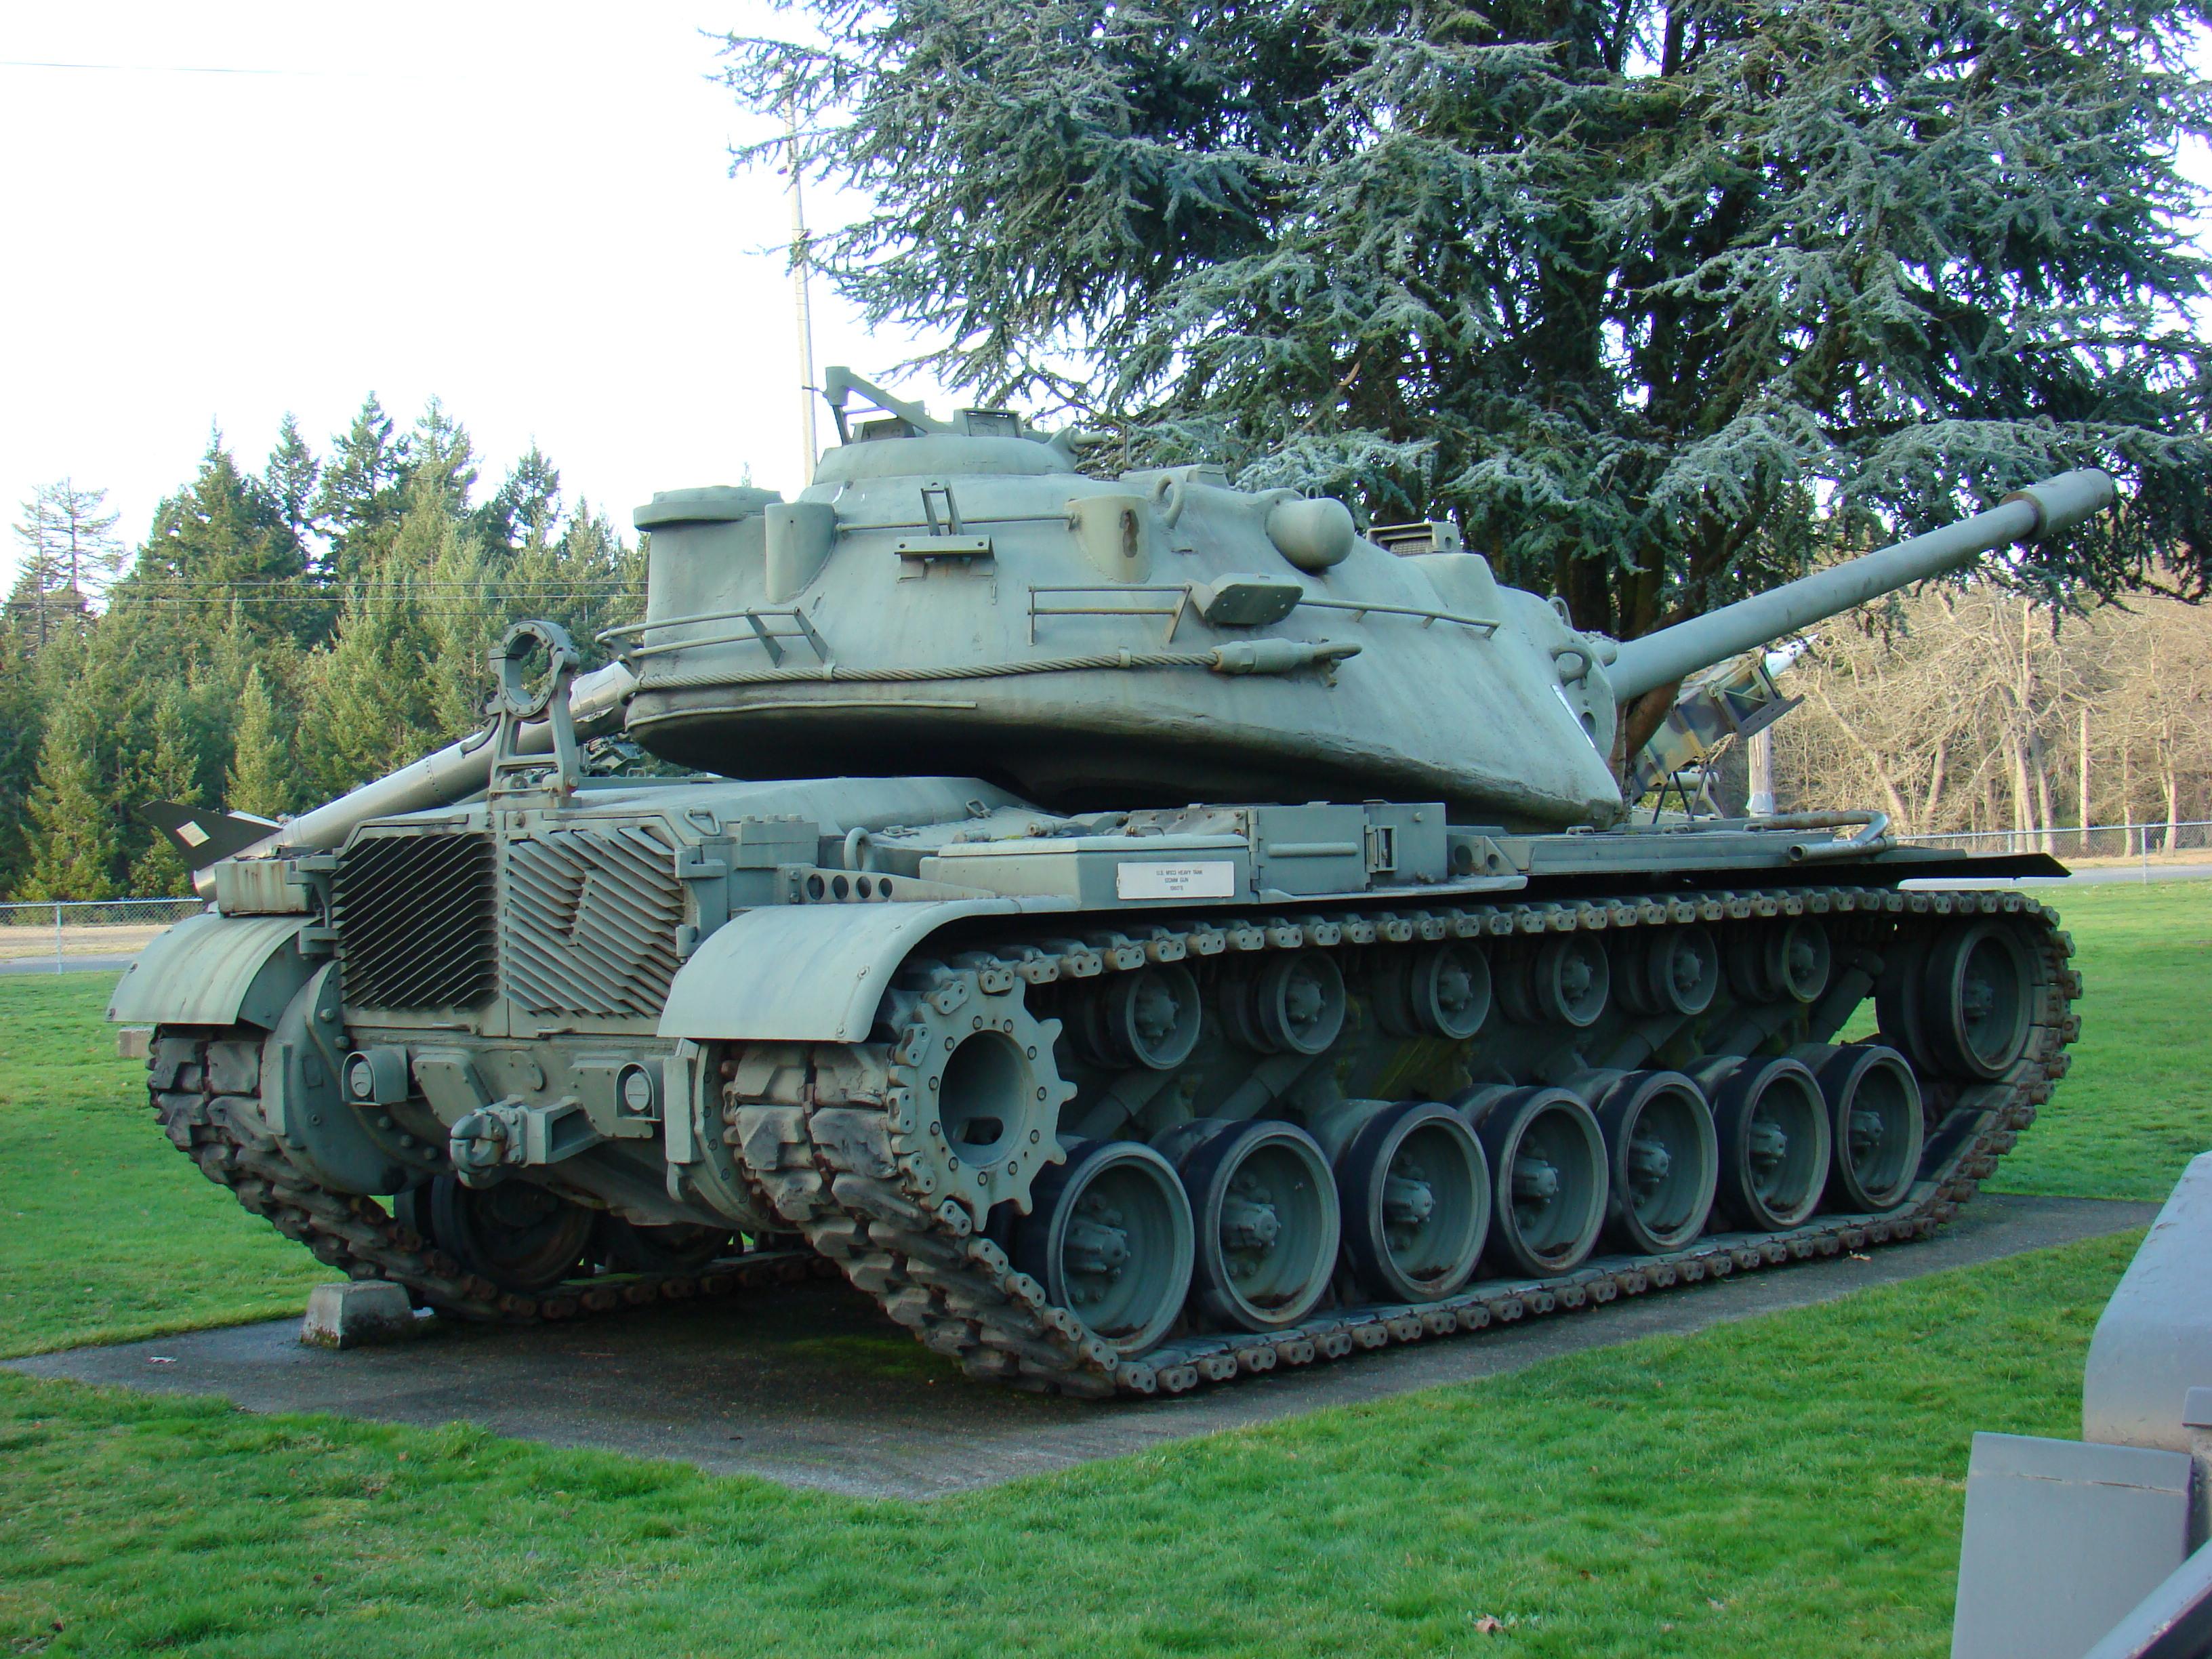 Description m103 heavy tank at ft lewis military museum